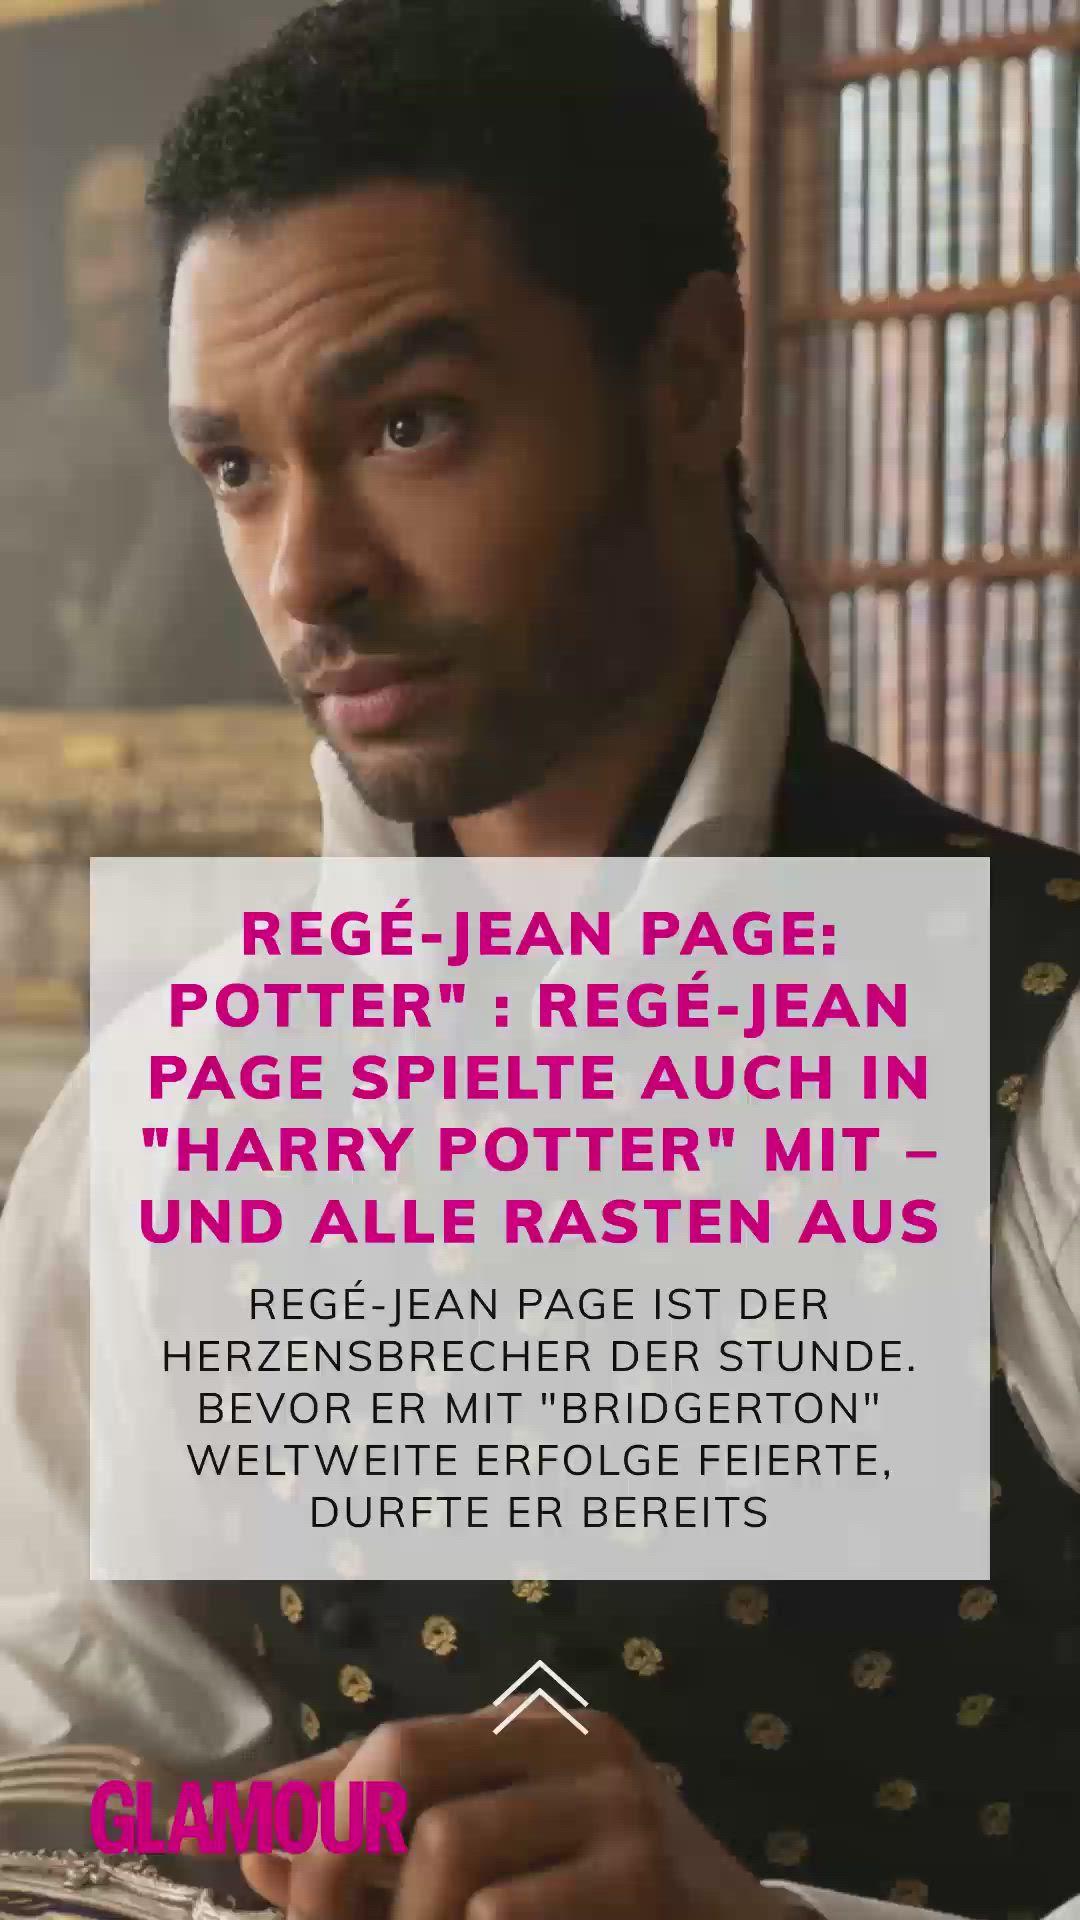 Bridgerton Star Rege Jean Page Bei Harry Potter Entdeckt Video Video In 2021 Netflix Filme Film Tipp Filme